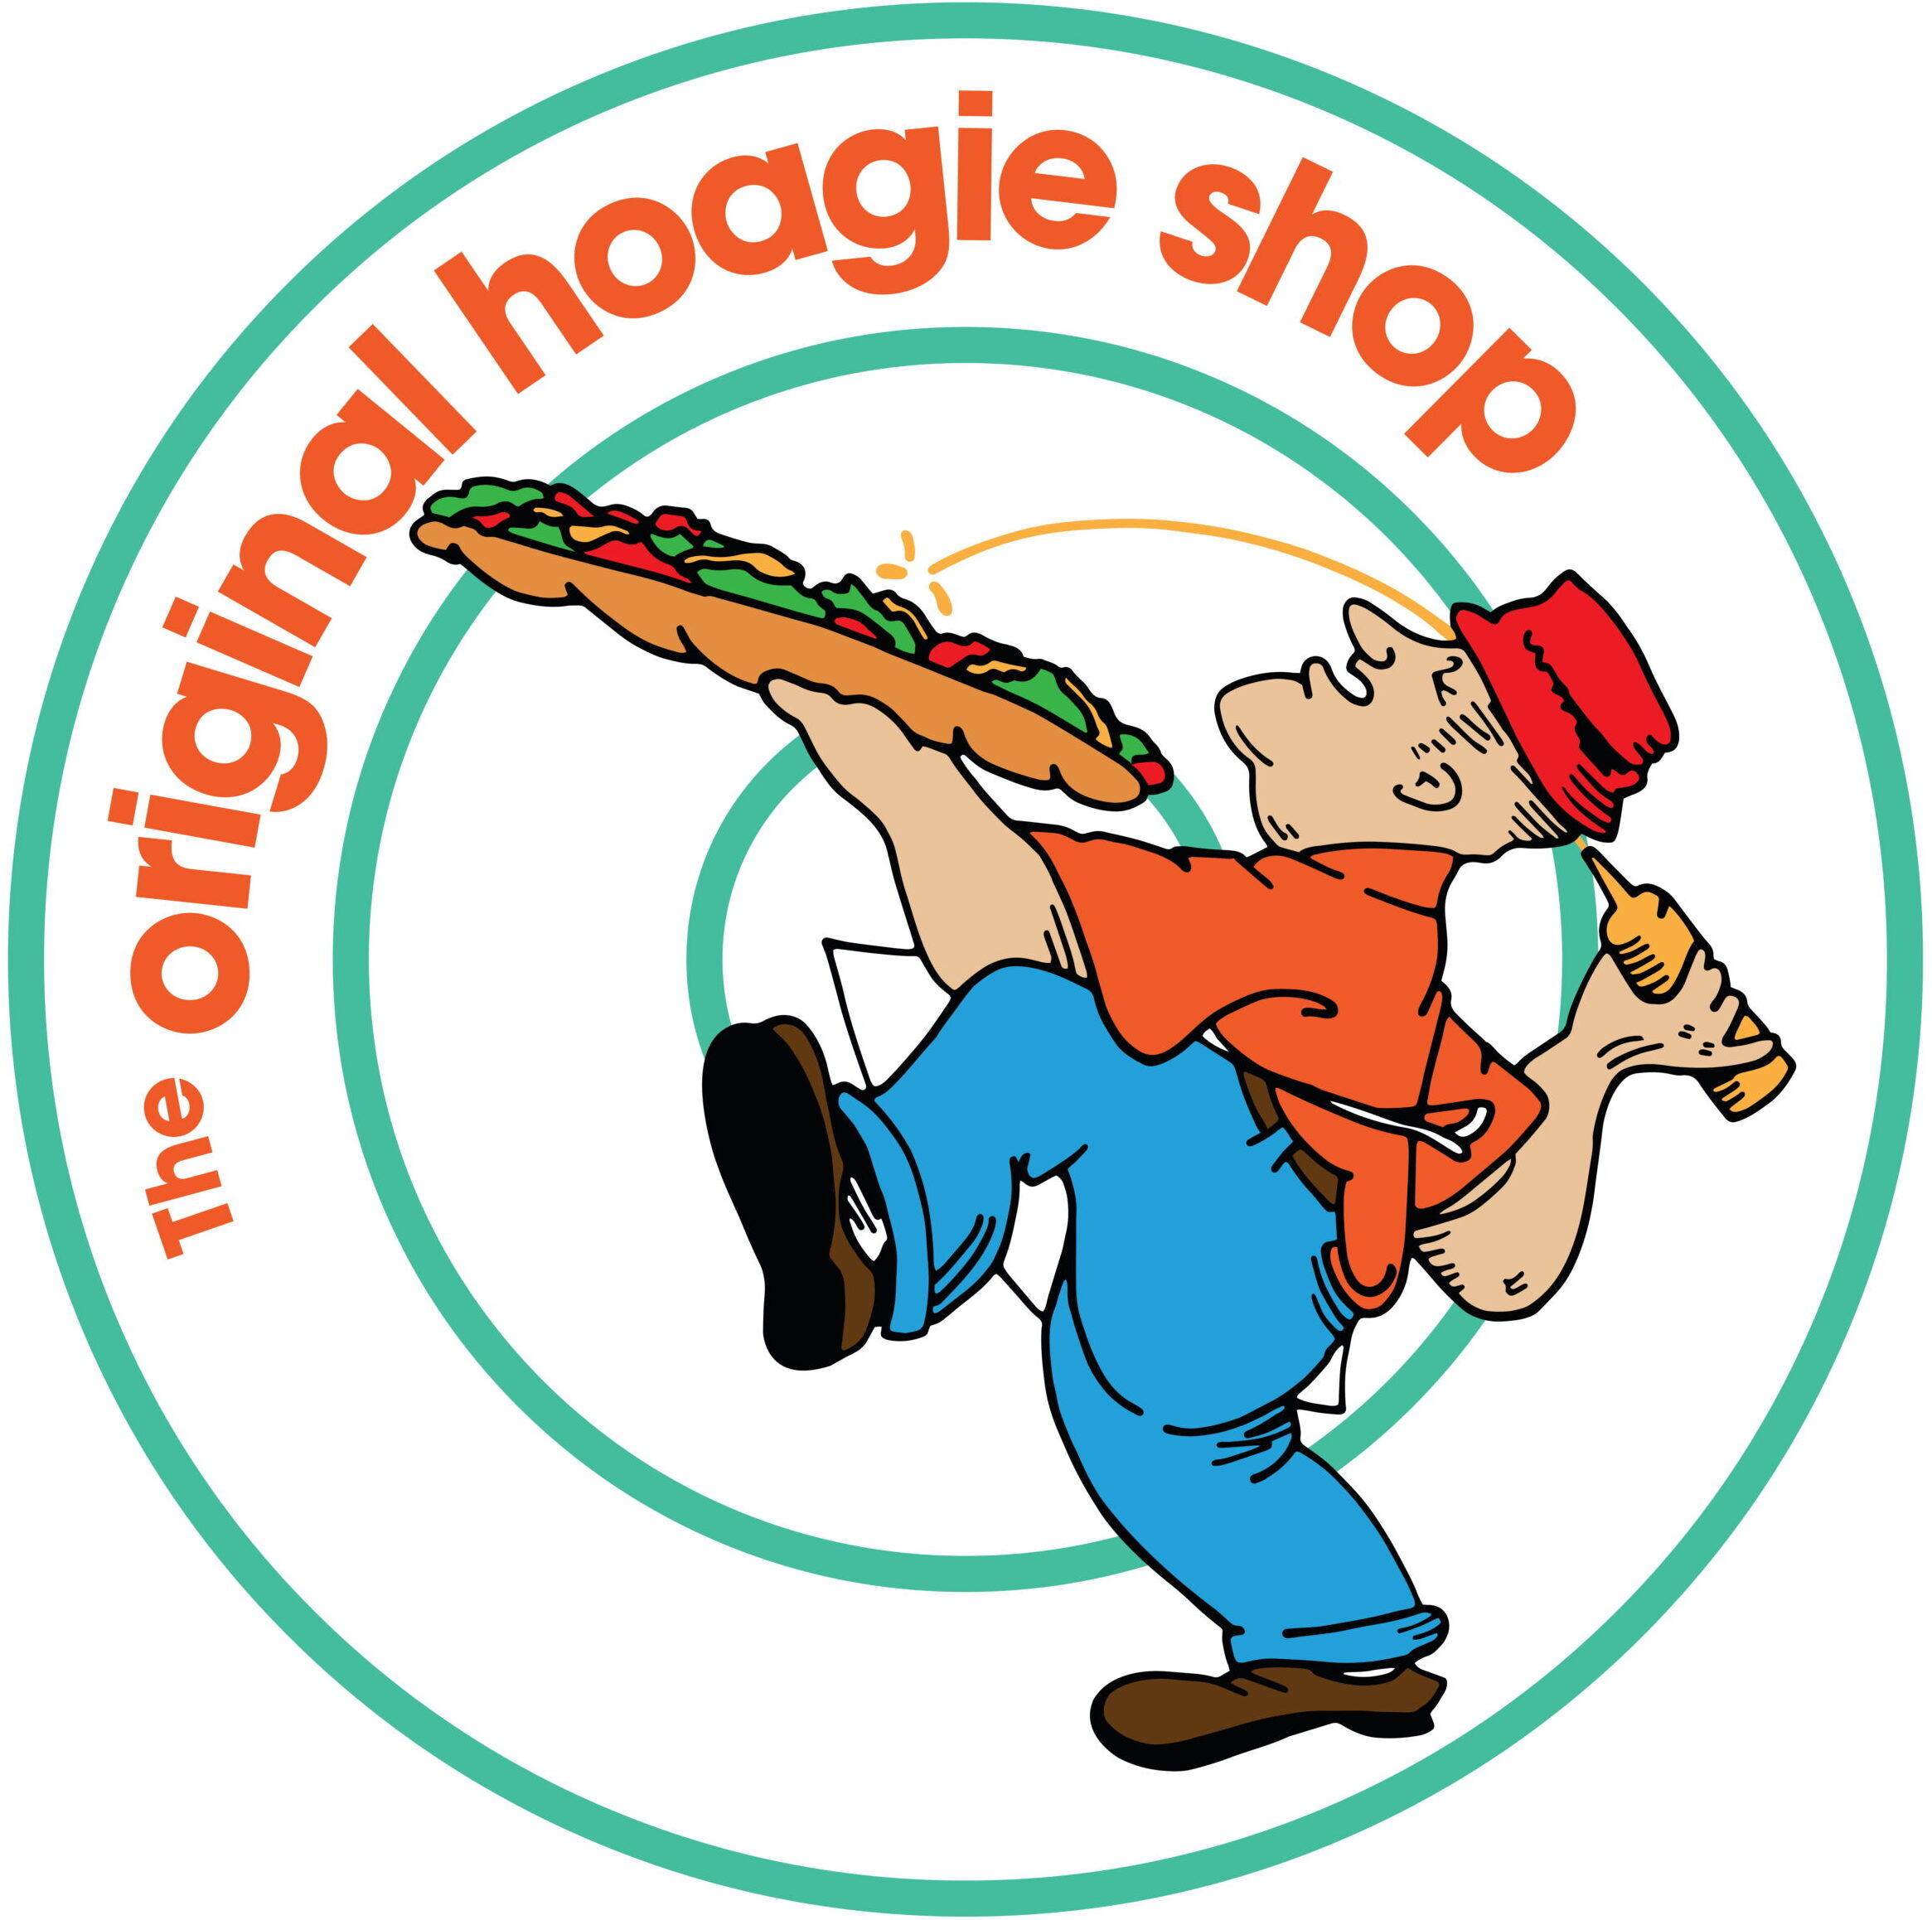 Original Hoagie Shop